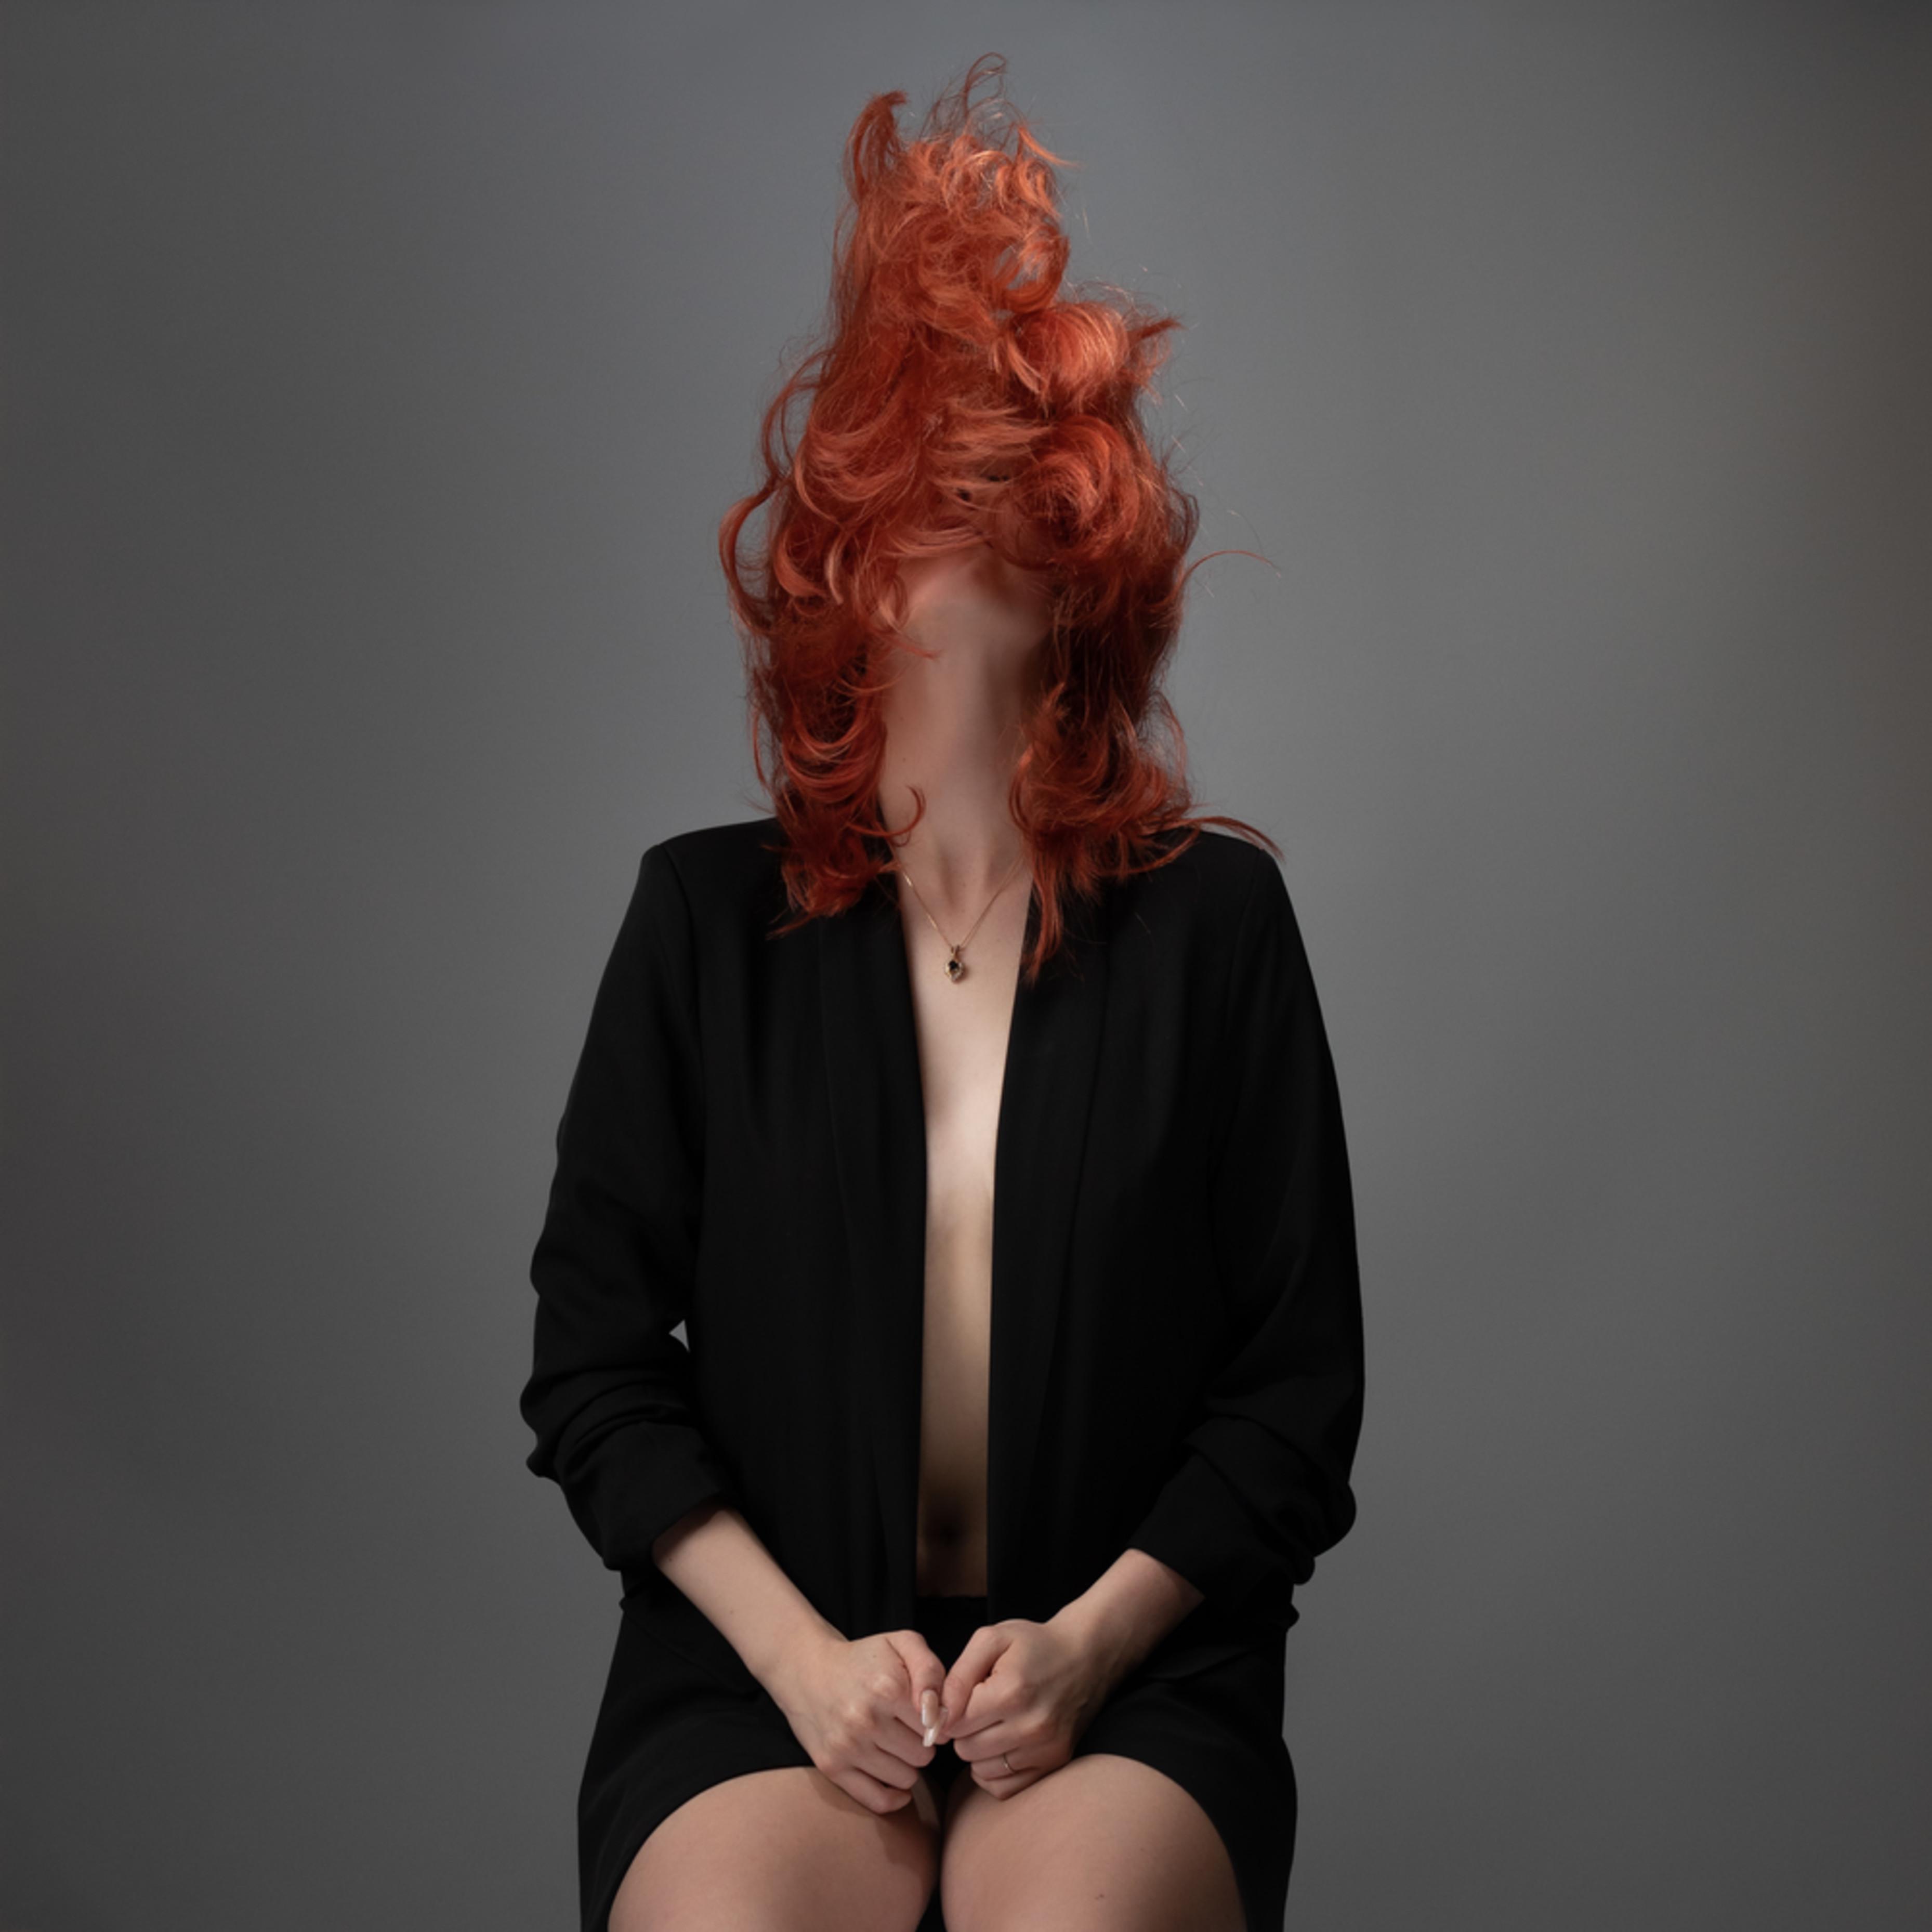 Flaming red hair g38x0x